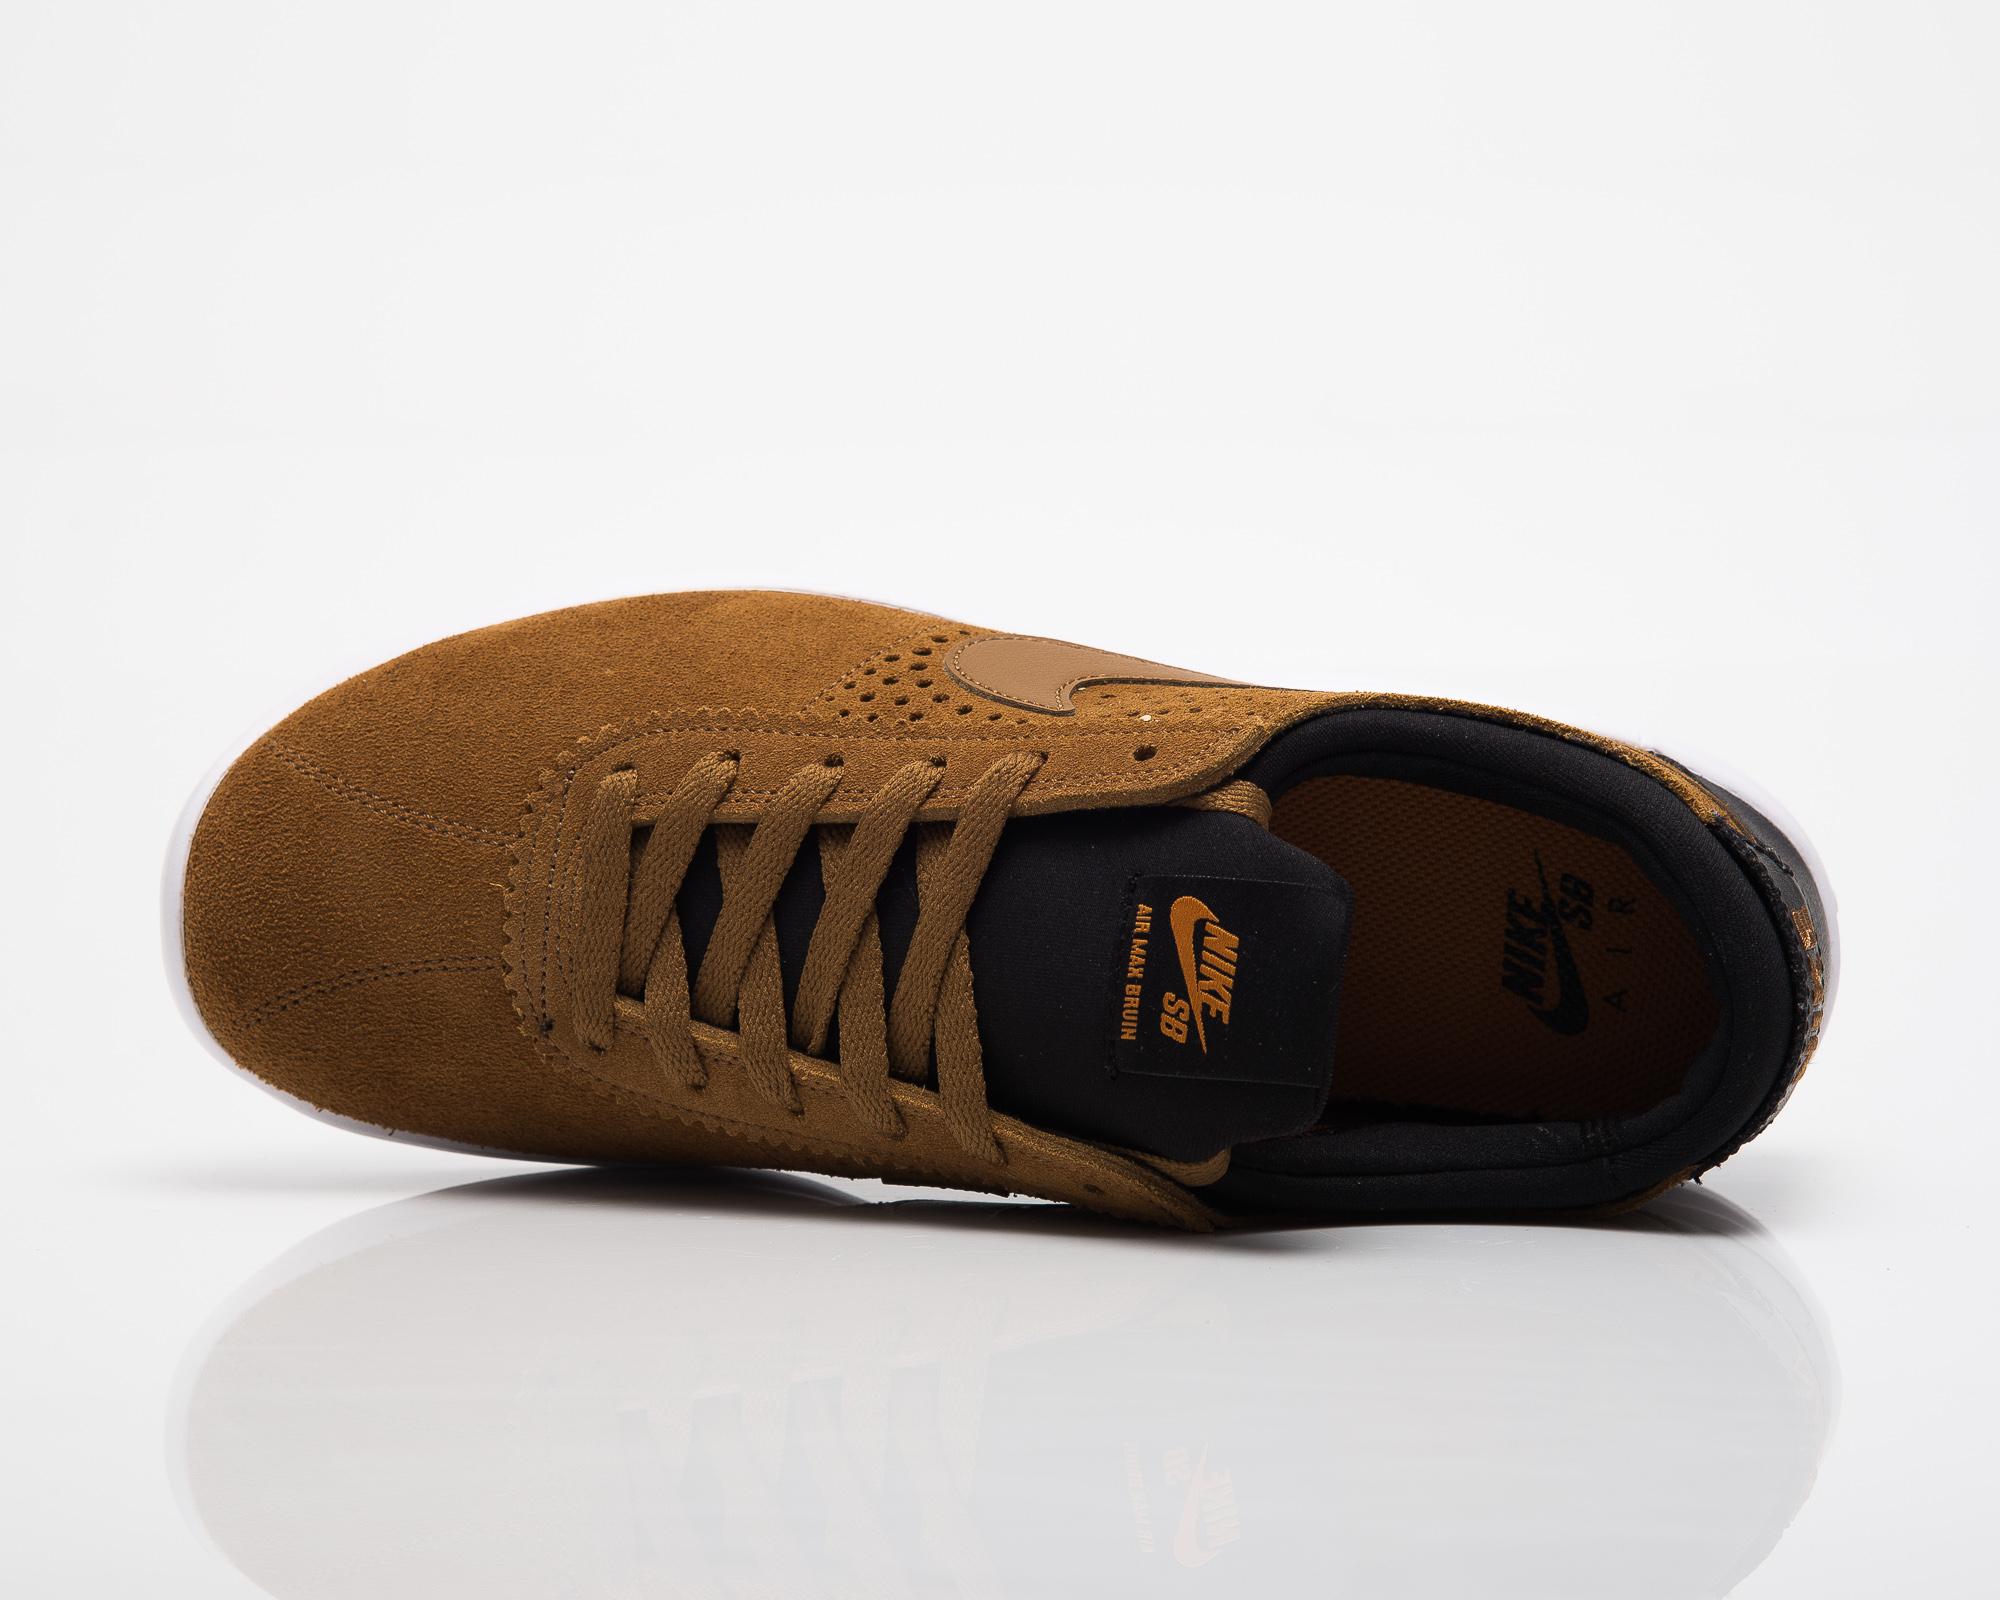 c4c09b56b542 Nike SB Air Max Bruin Vapor - Shoes Casual - Sporting goods